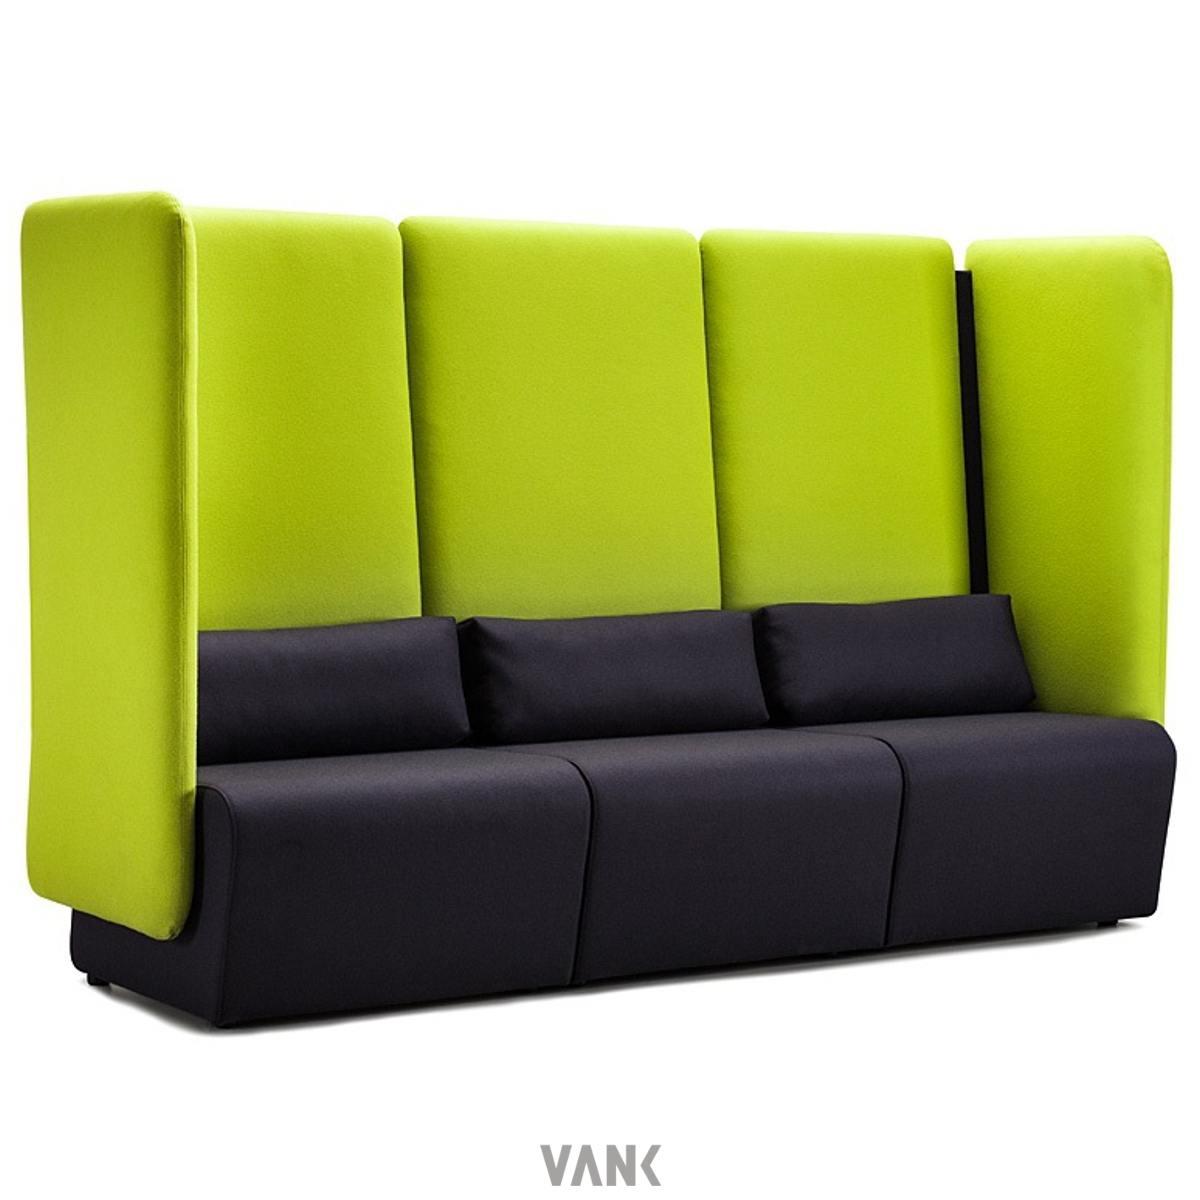 VANK-mont (3)